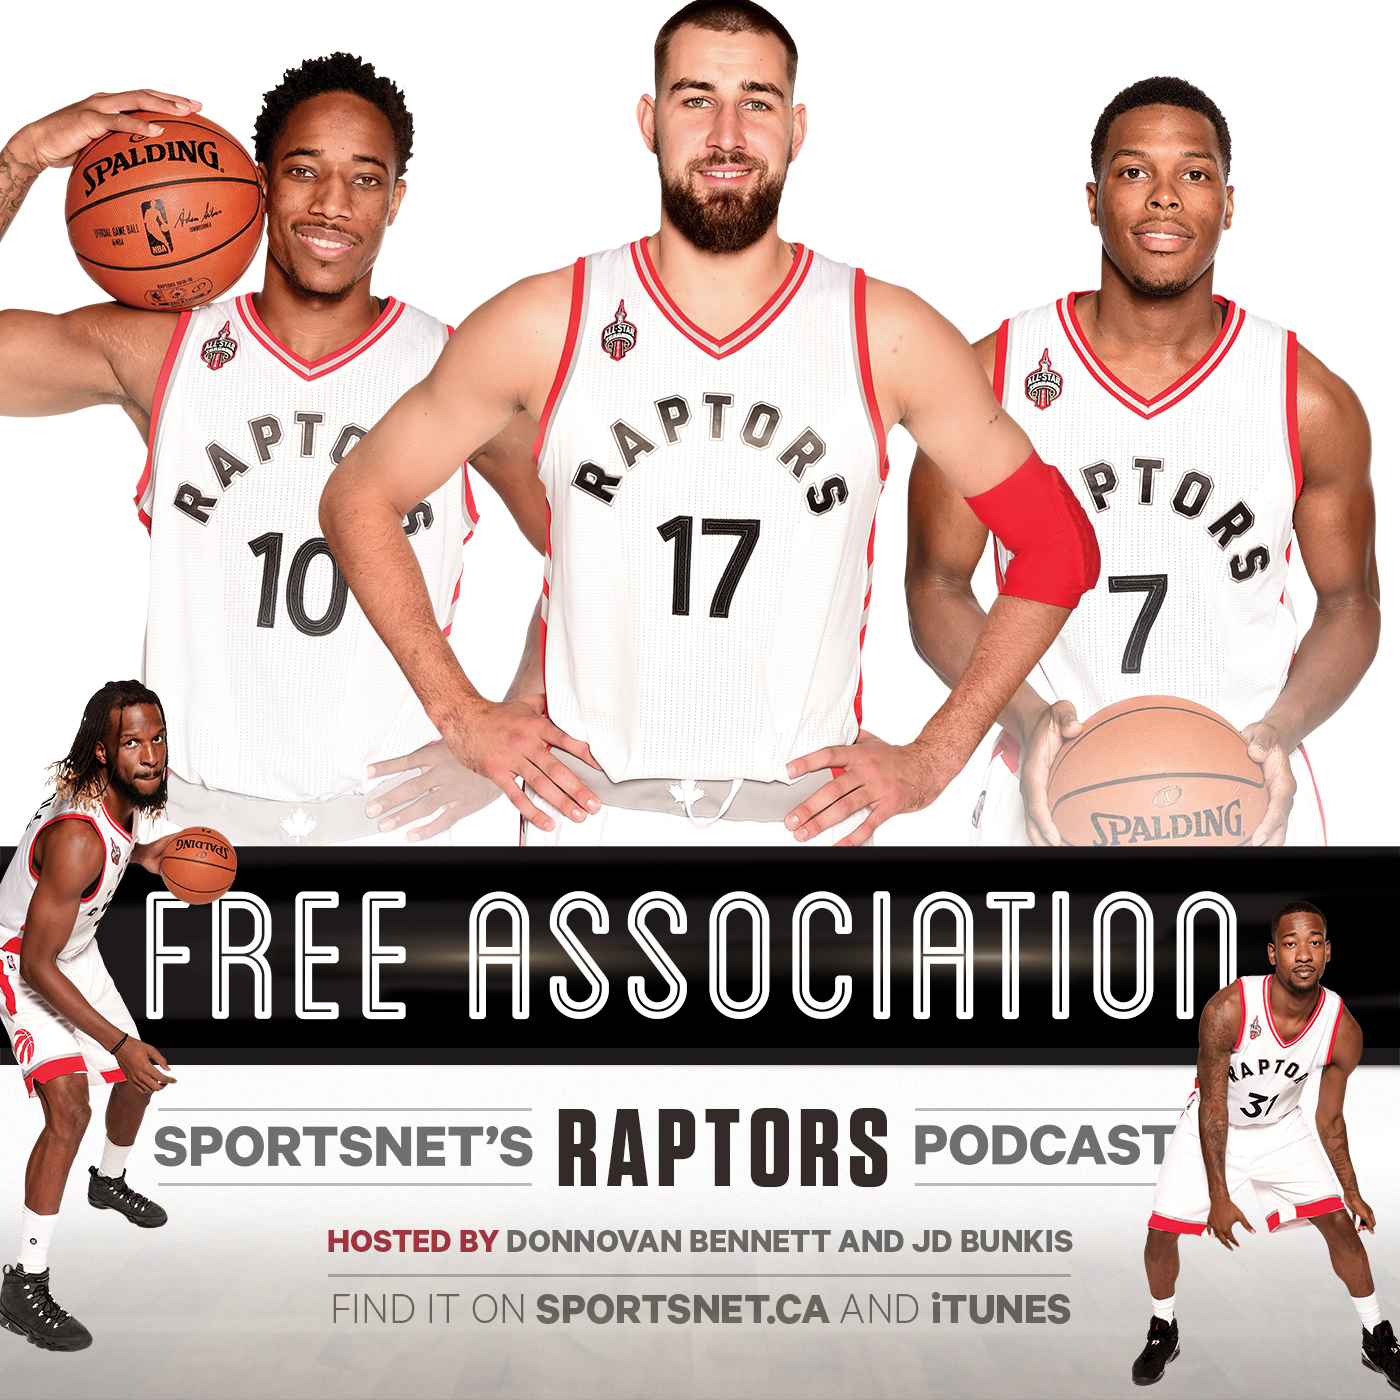 Free Association, Sportsnet's Toronto Raptors podcast